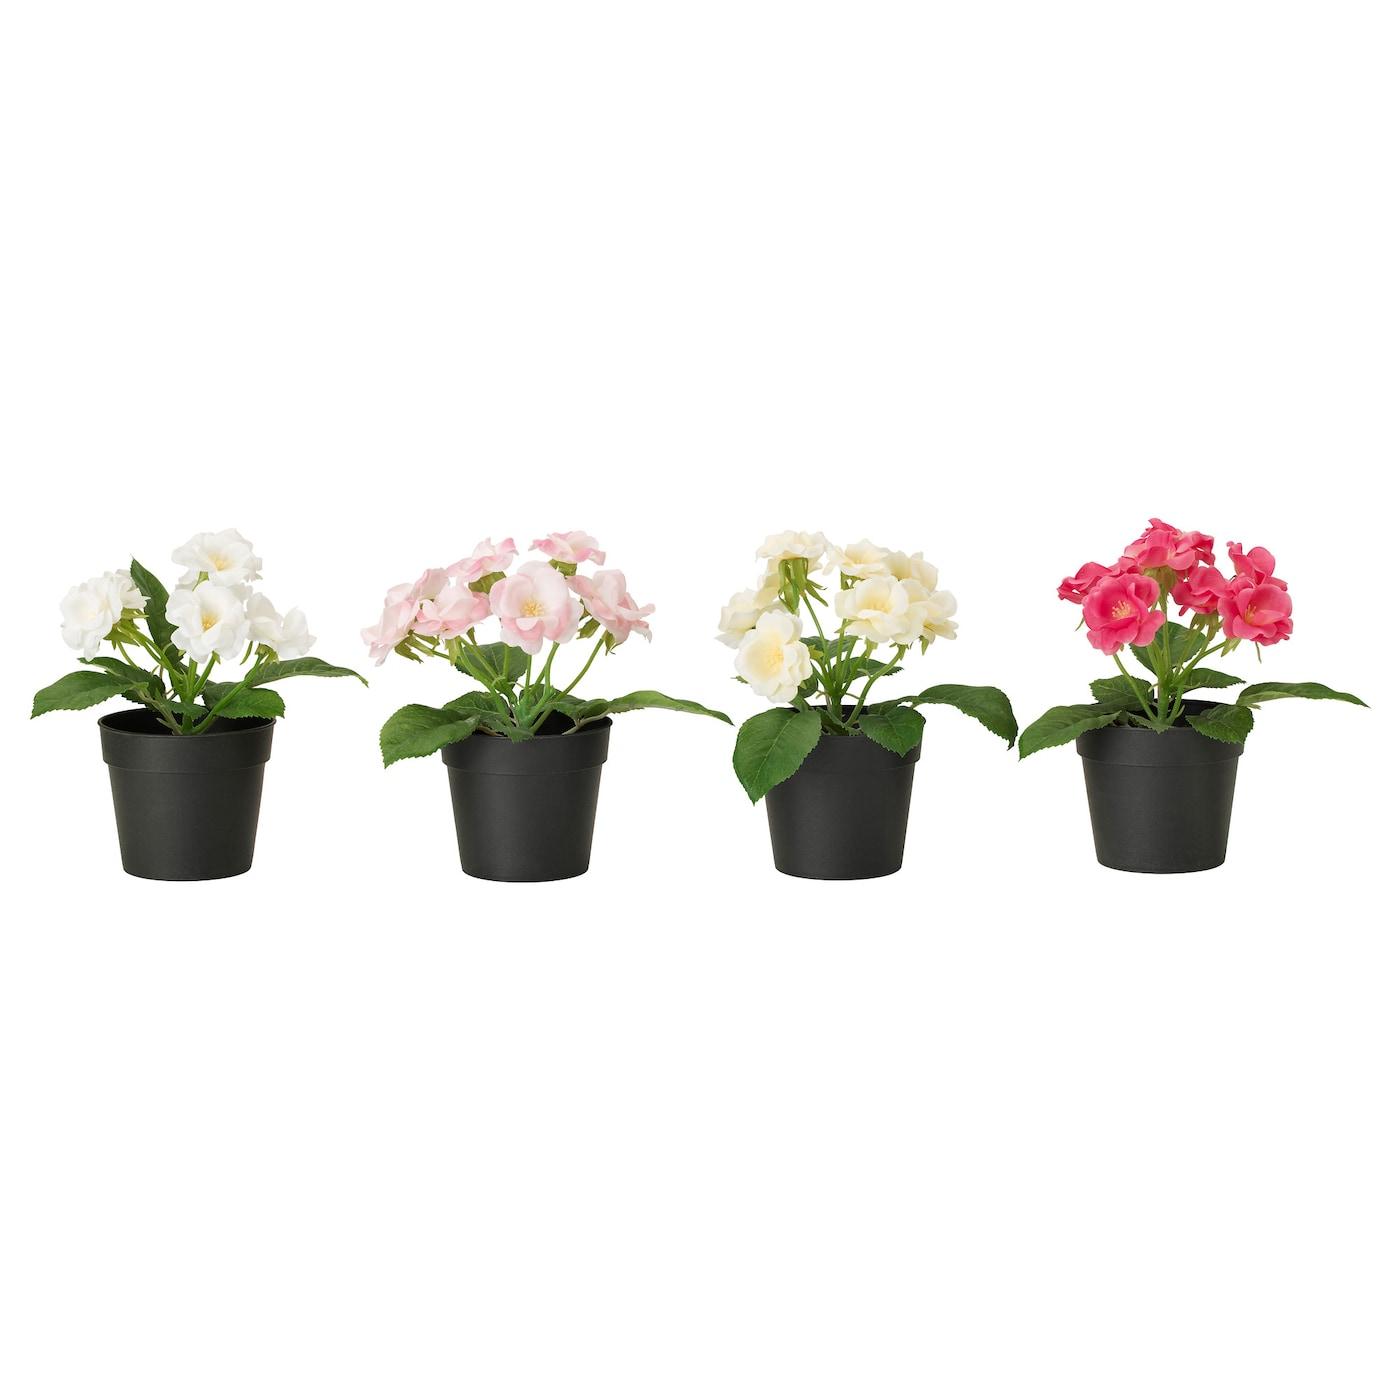 Fejka artificial potted plant rose assorted colours 9 cm ikea - Ikea plante artificiel ...